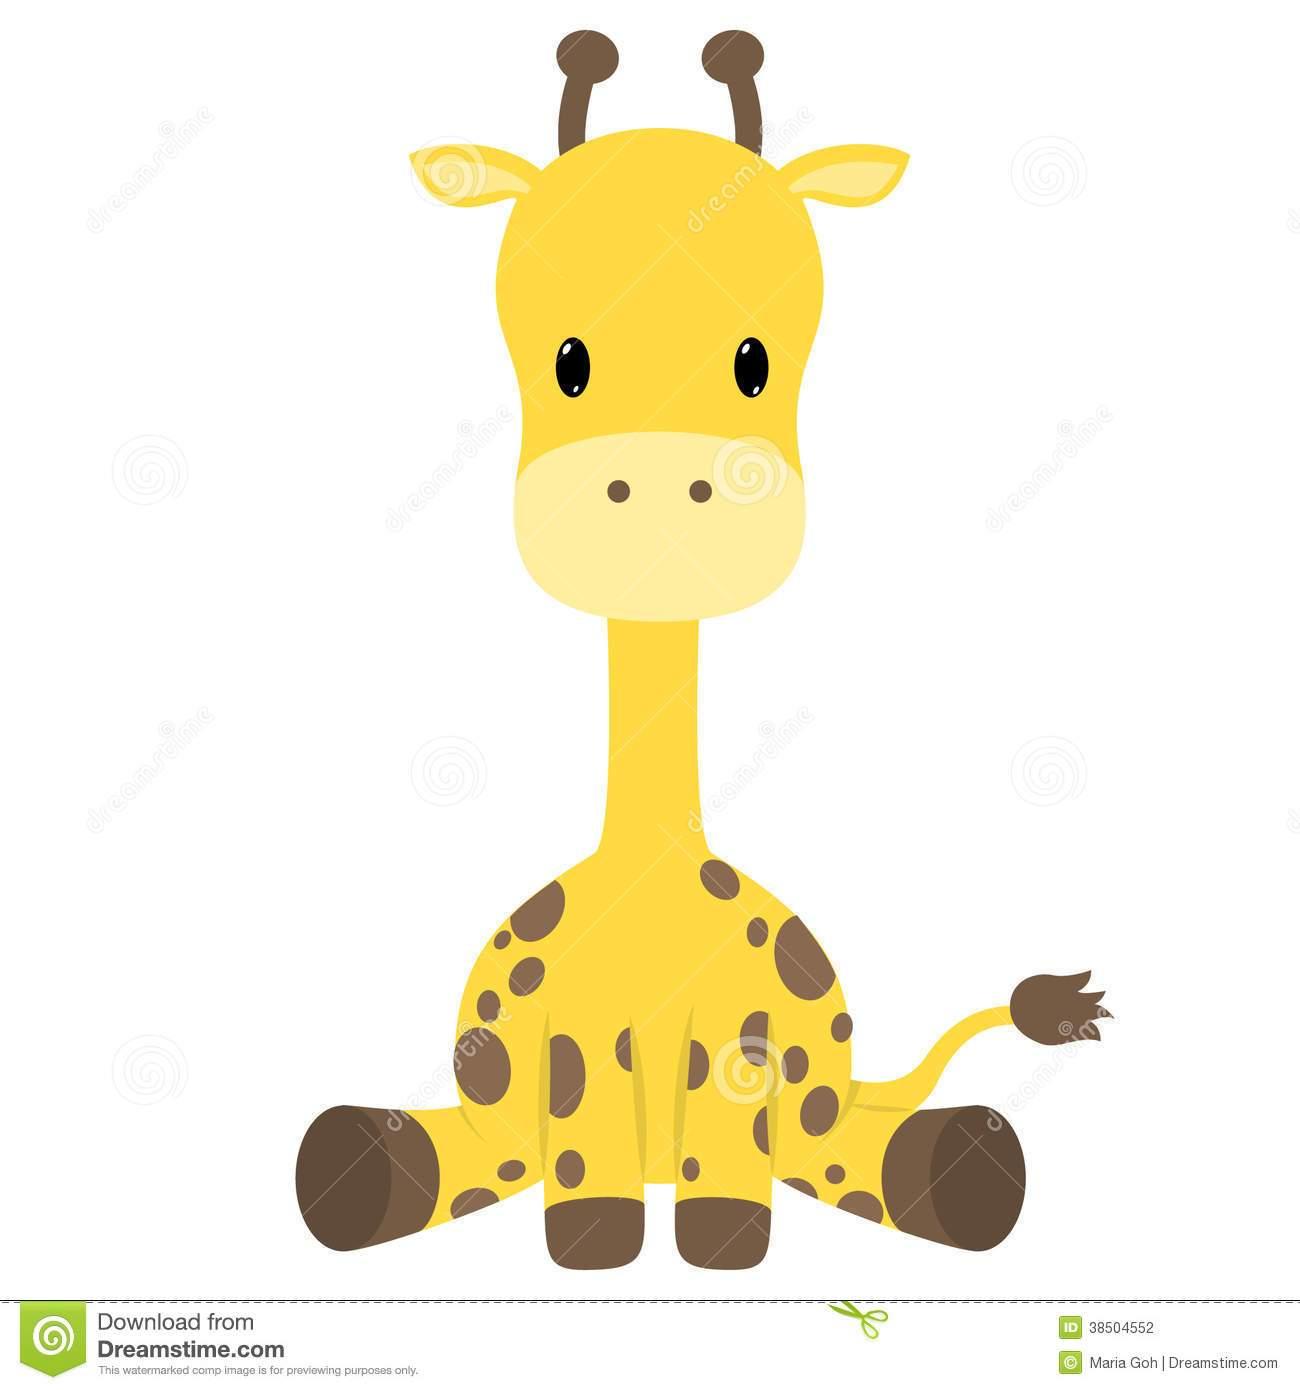 Giraffe baby clipart » Clipart Portal.